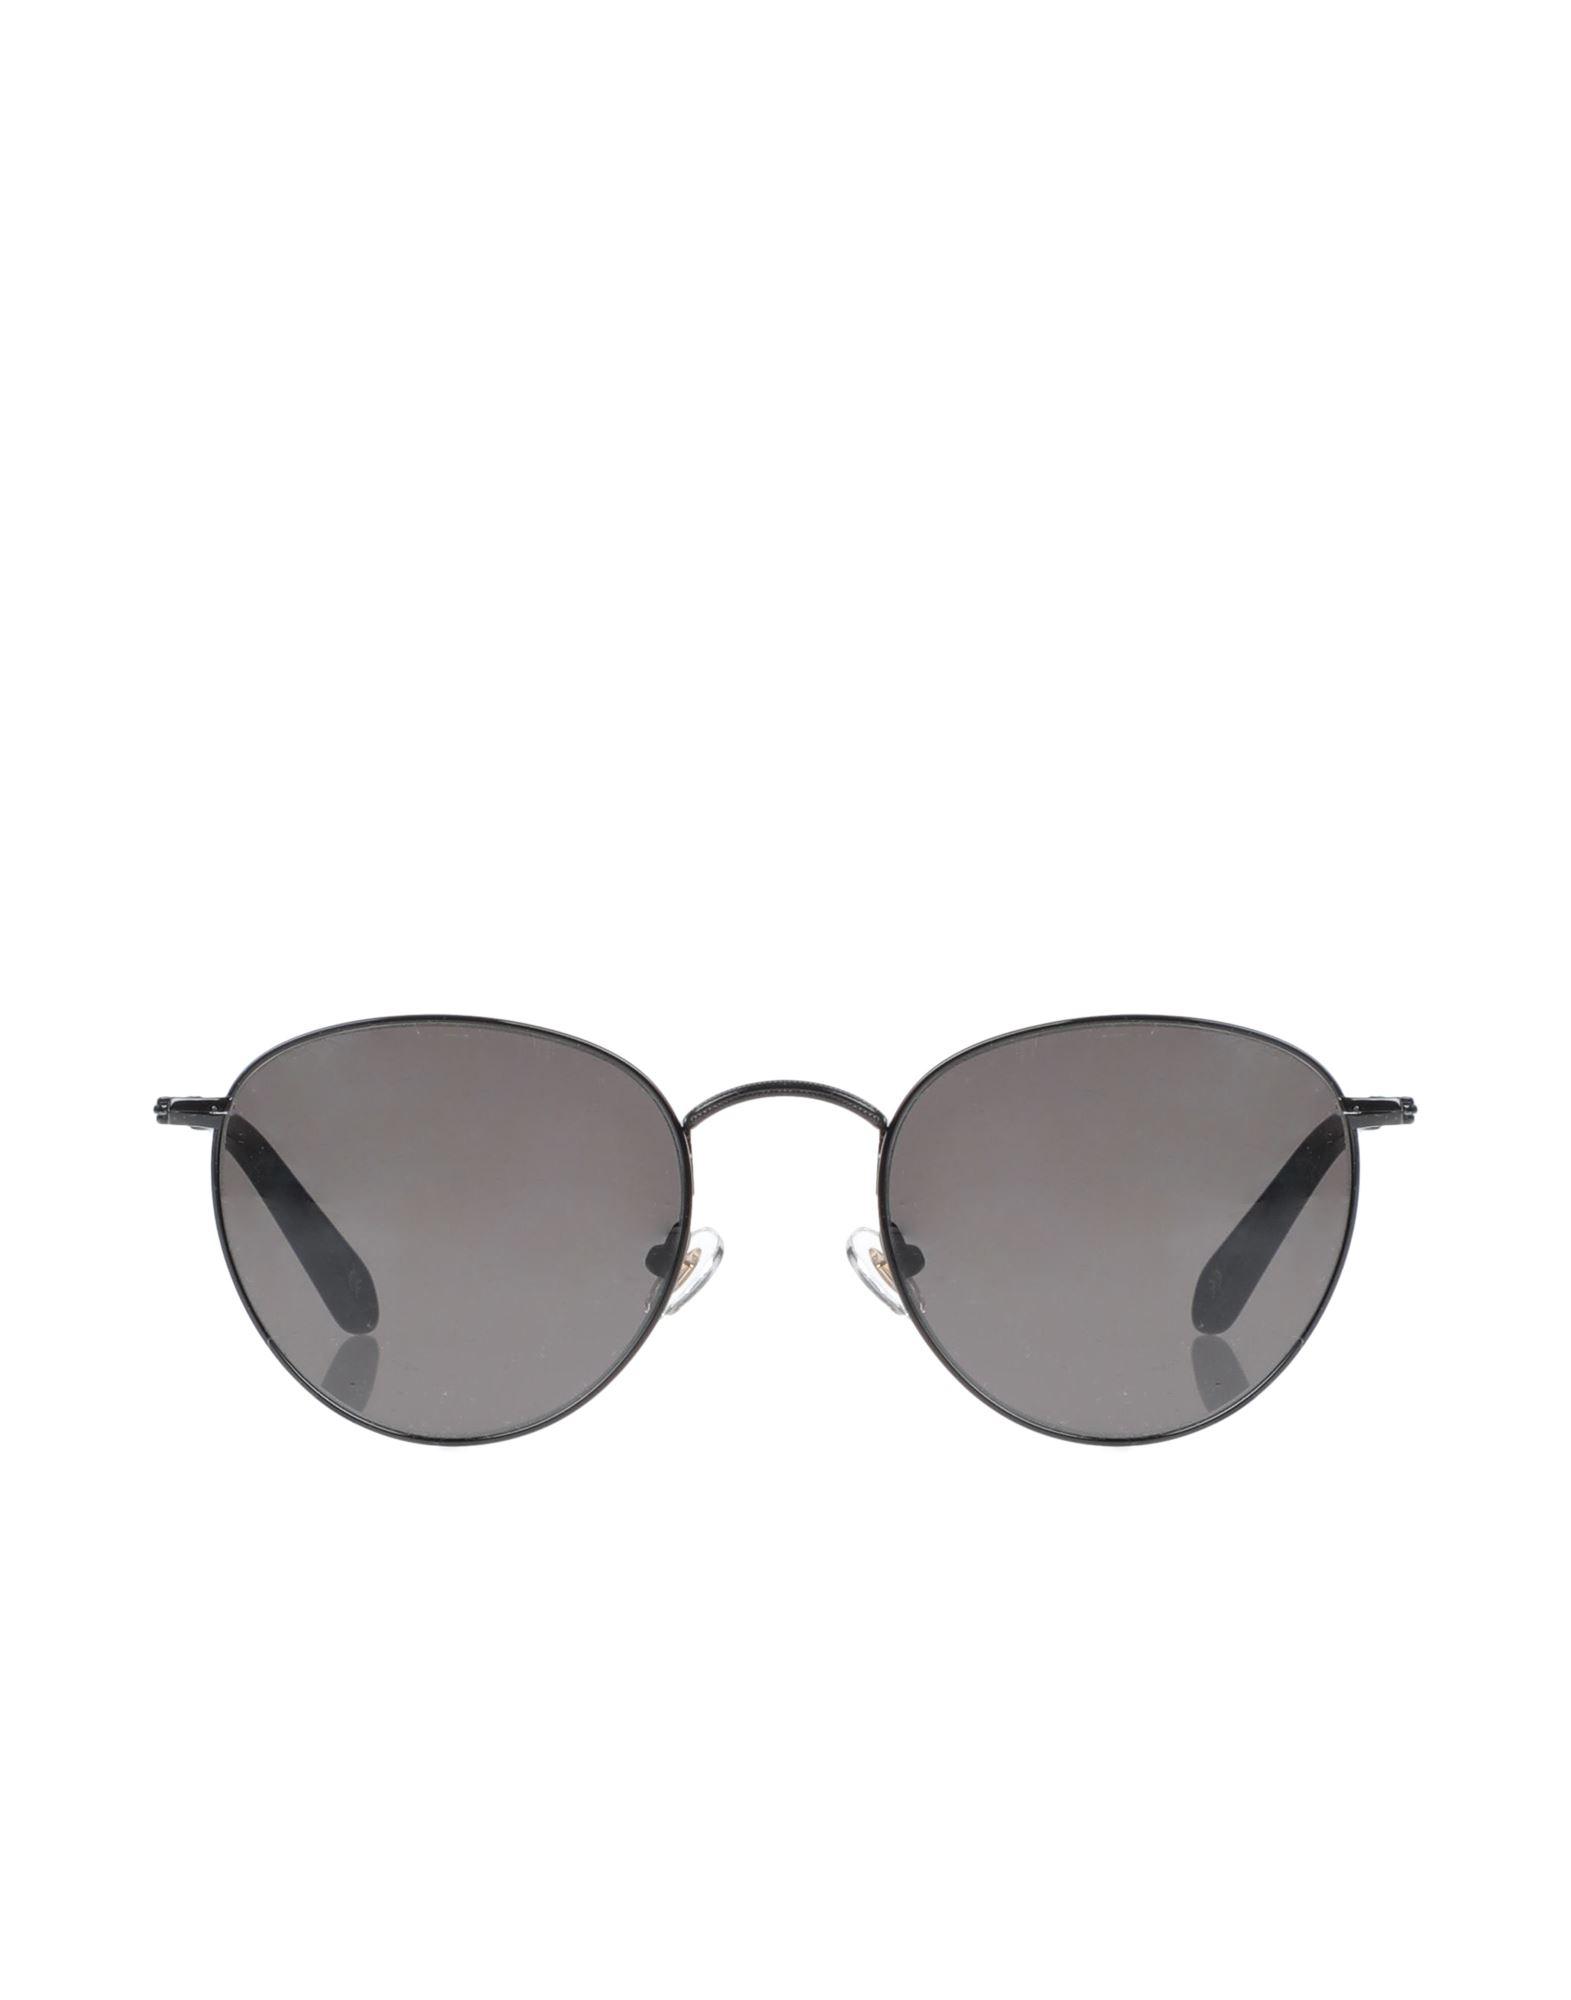 HAN KJØBENHAVN Sunglasses - Item 46738991